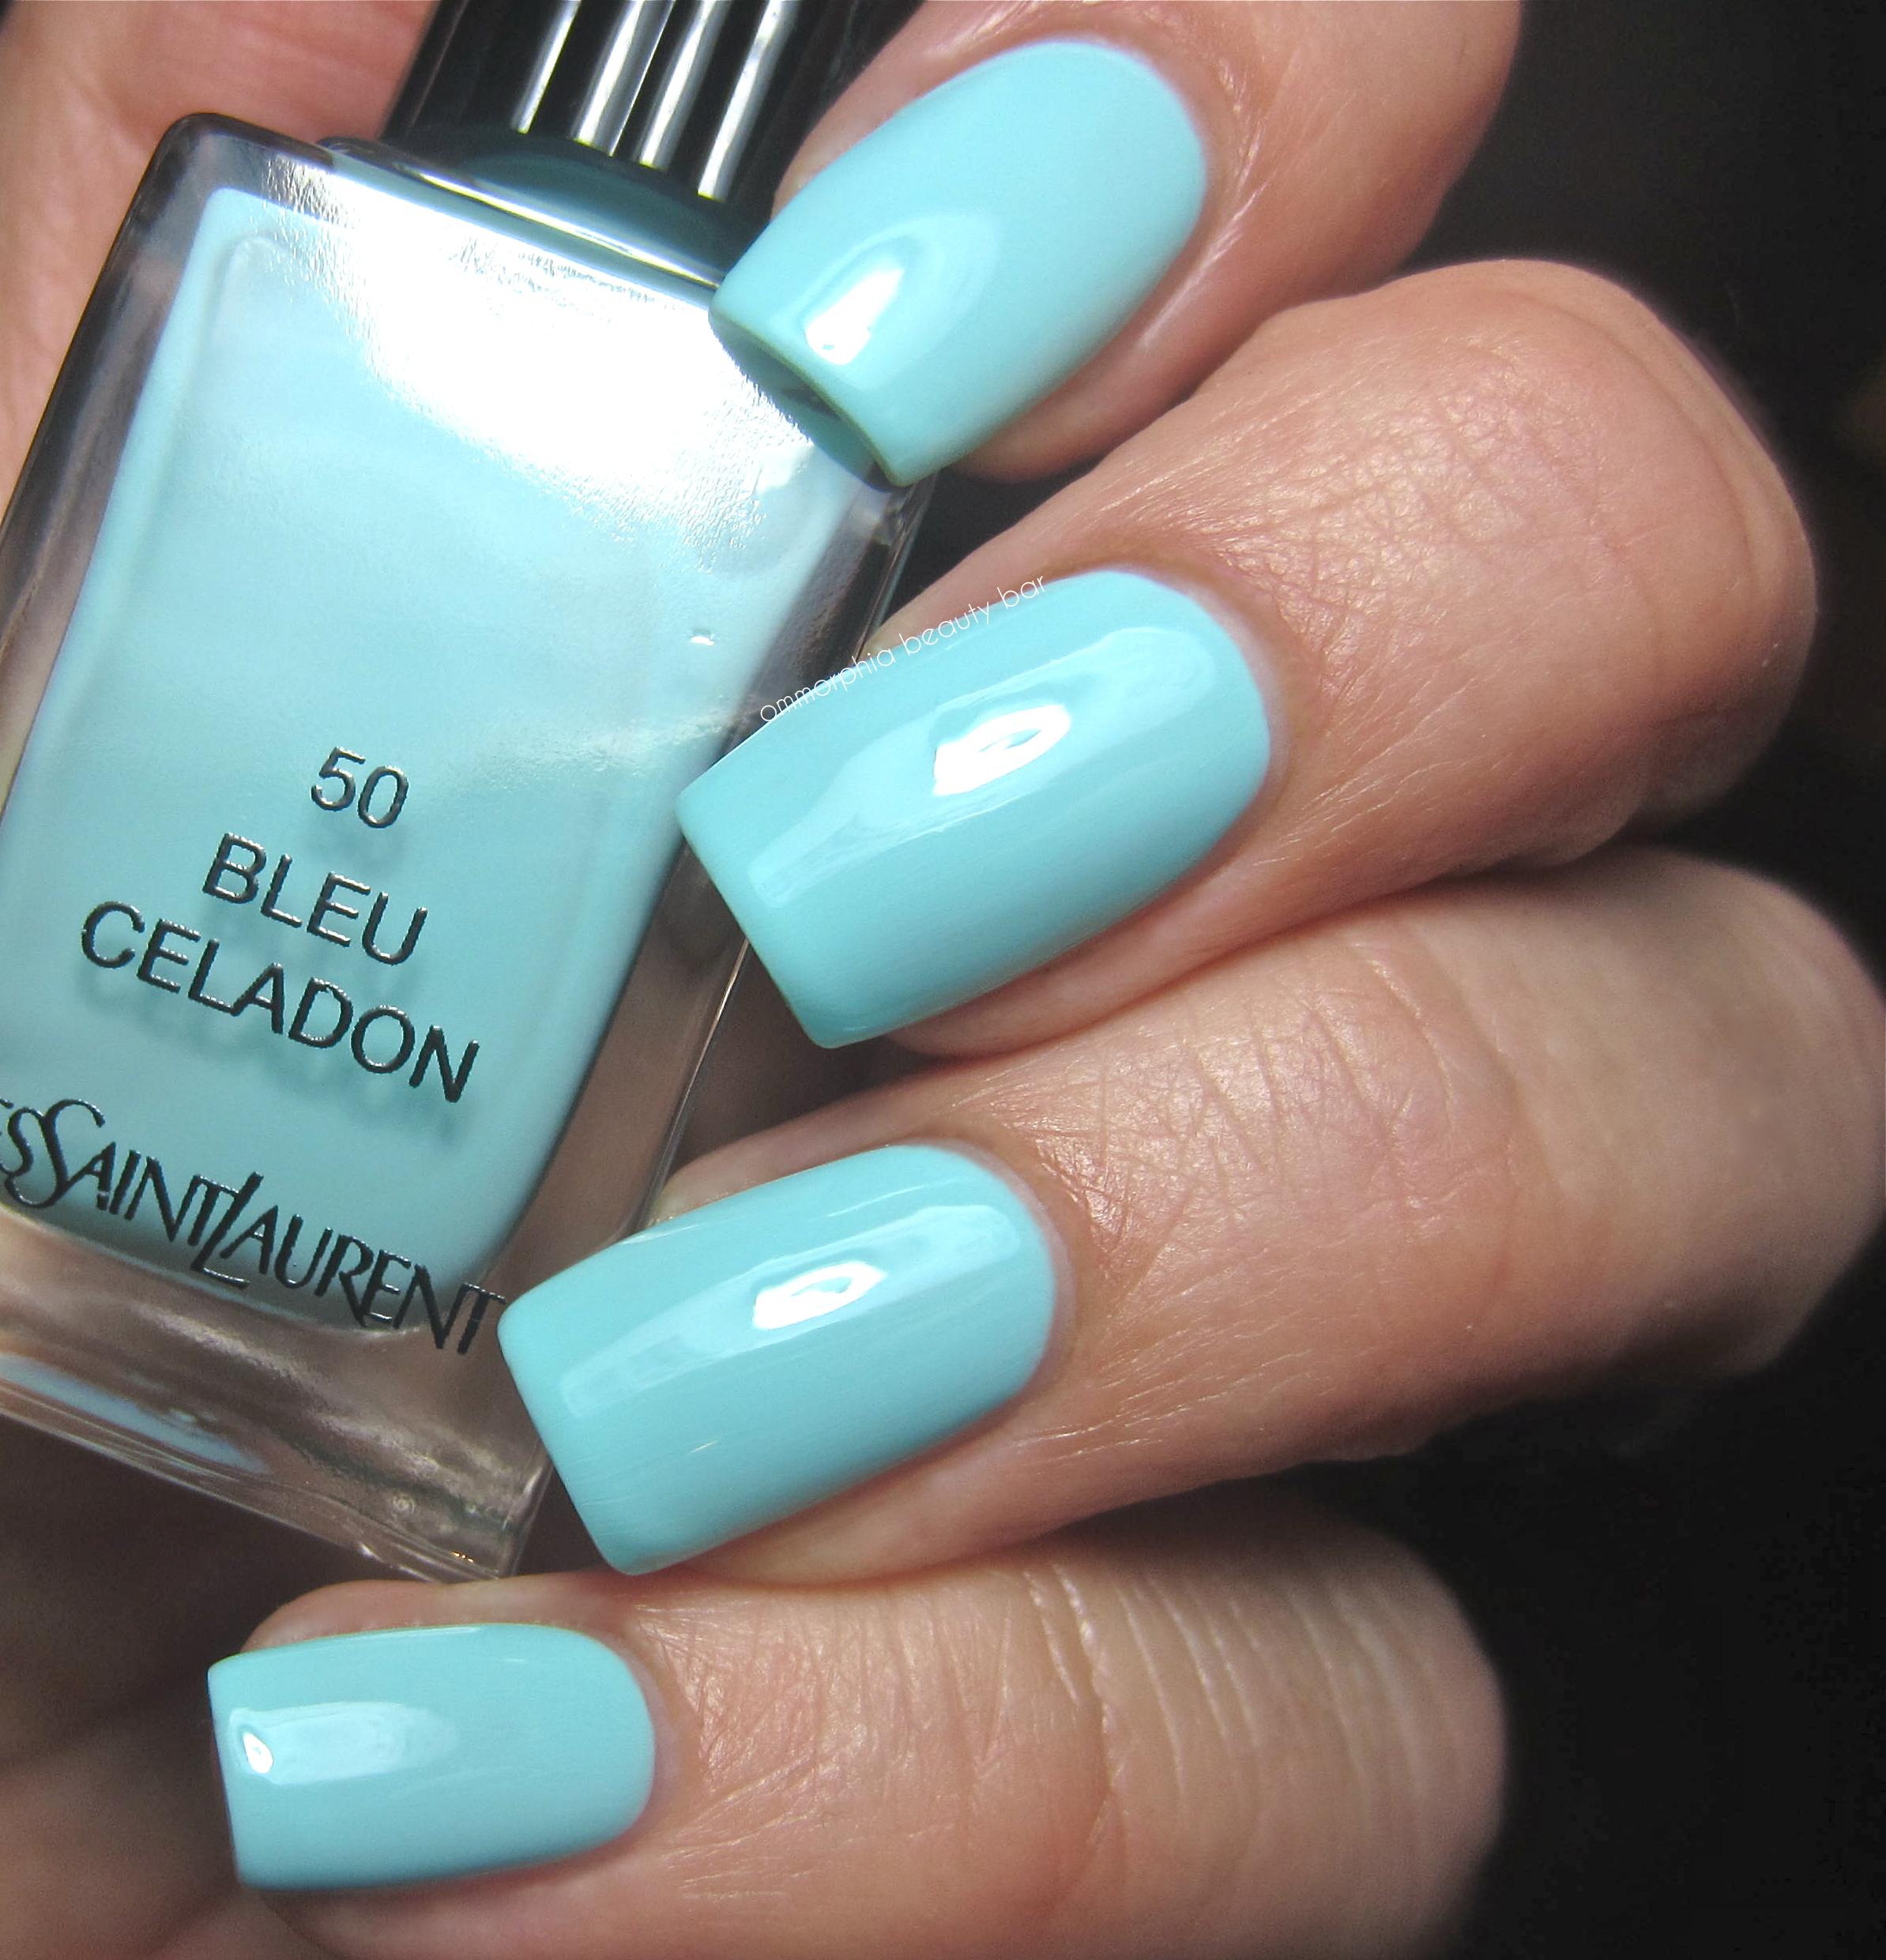 ysl 50 bleu celadon 51 bleu cyclades bleus lumi re collection summer 2014 ommorphia. Black Bedroom Furniture Sets. Home Design Ideas